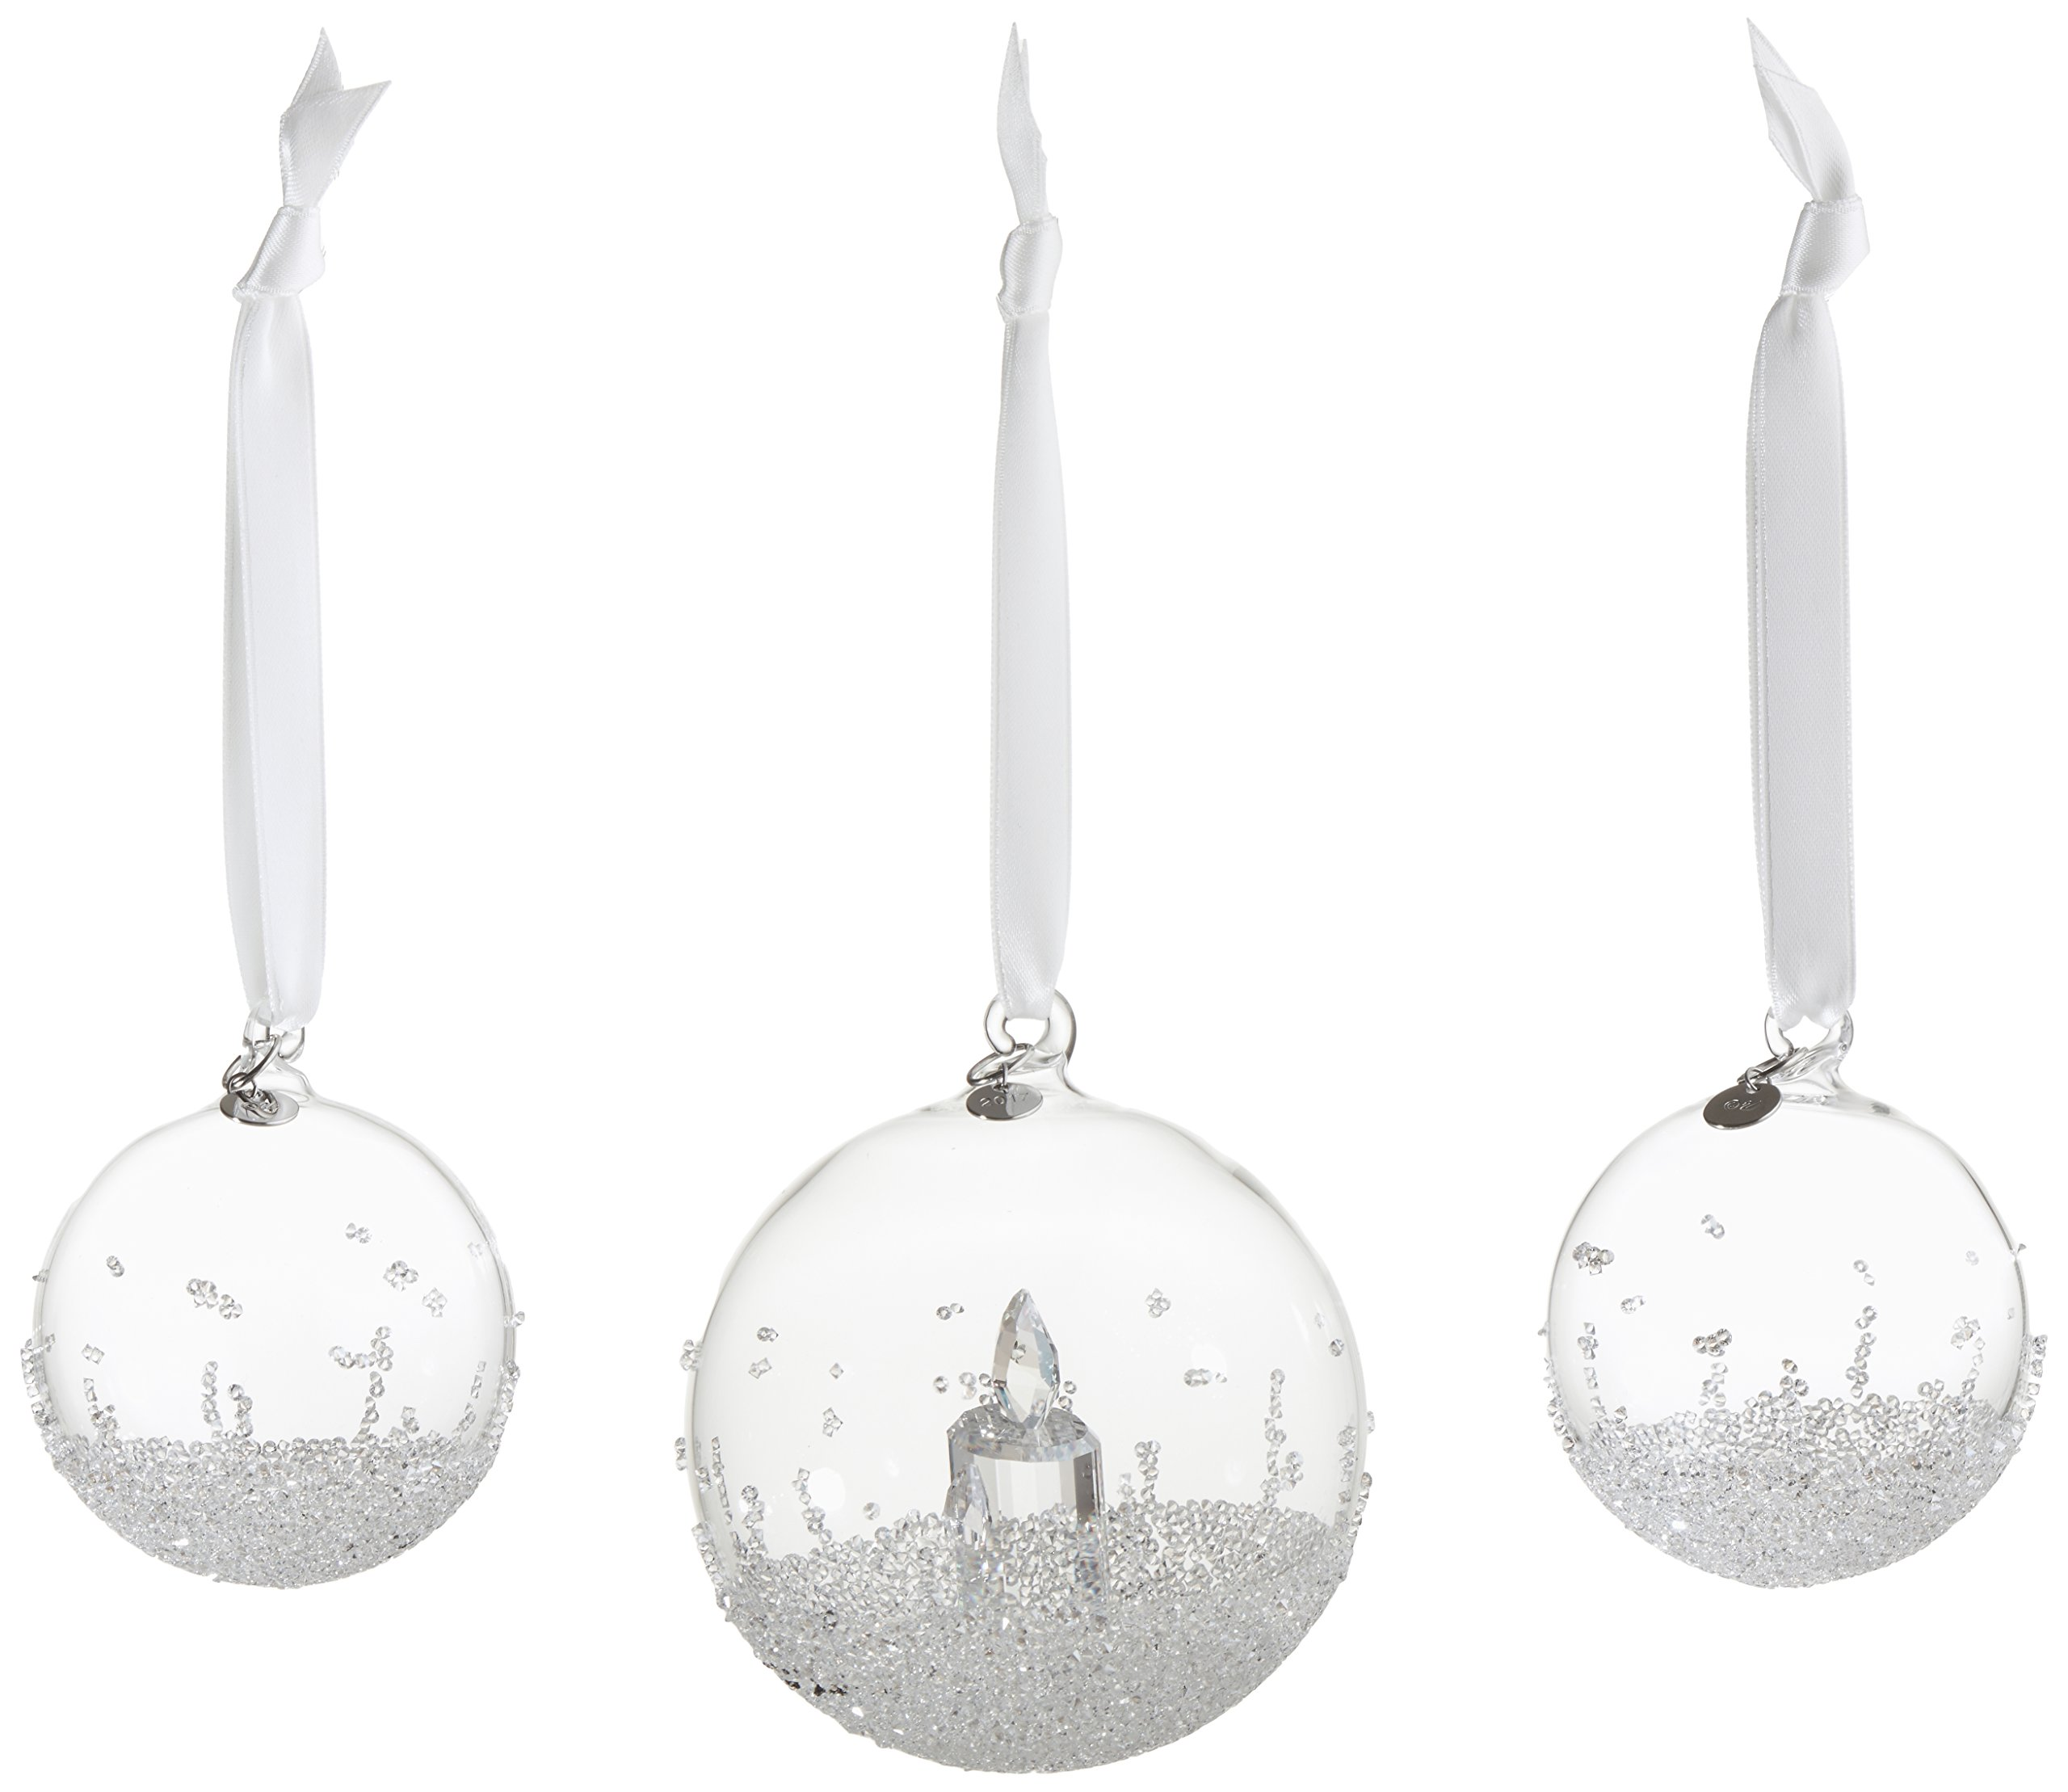 Swarovski Christmas Ball Ornament Set Annual Edition 2017